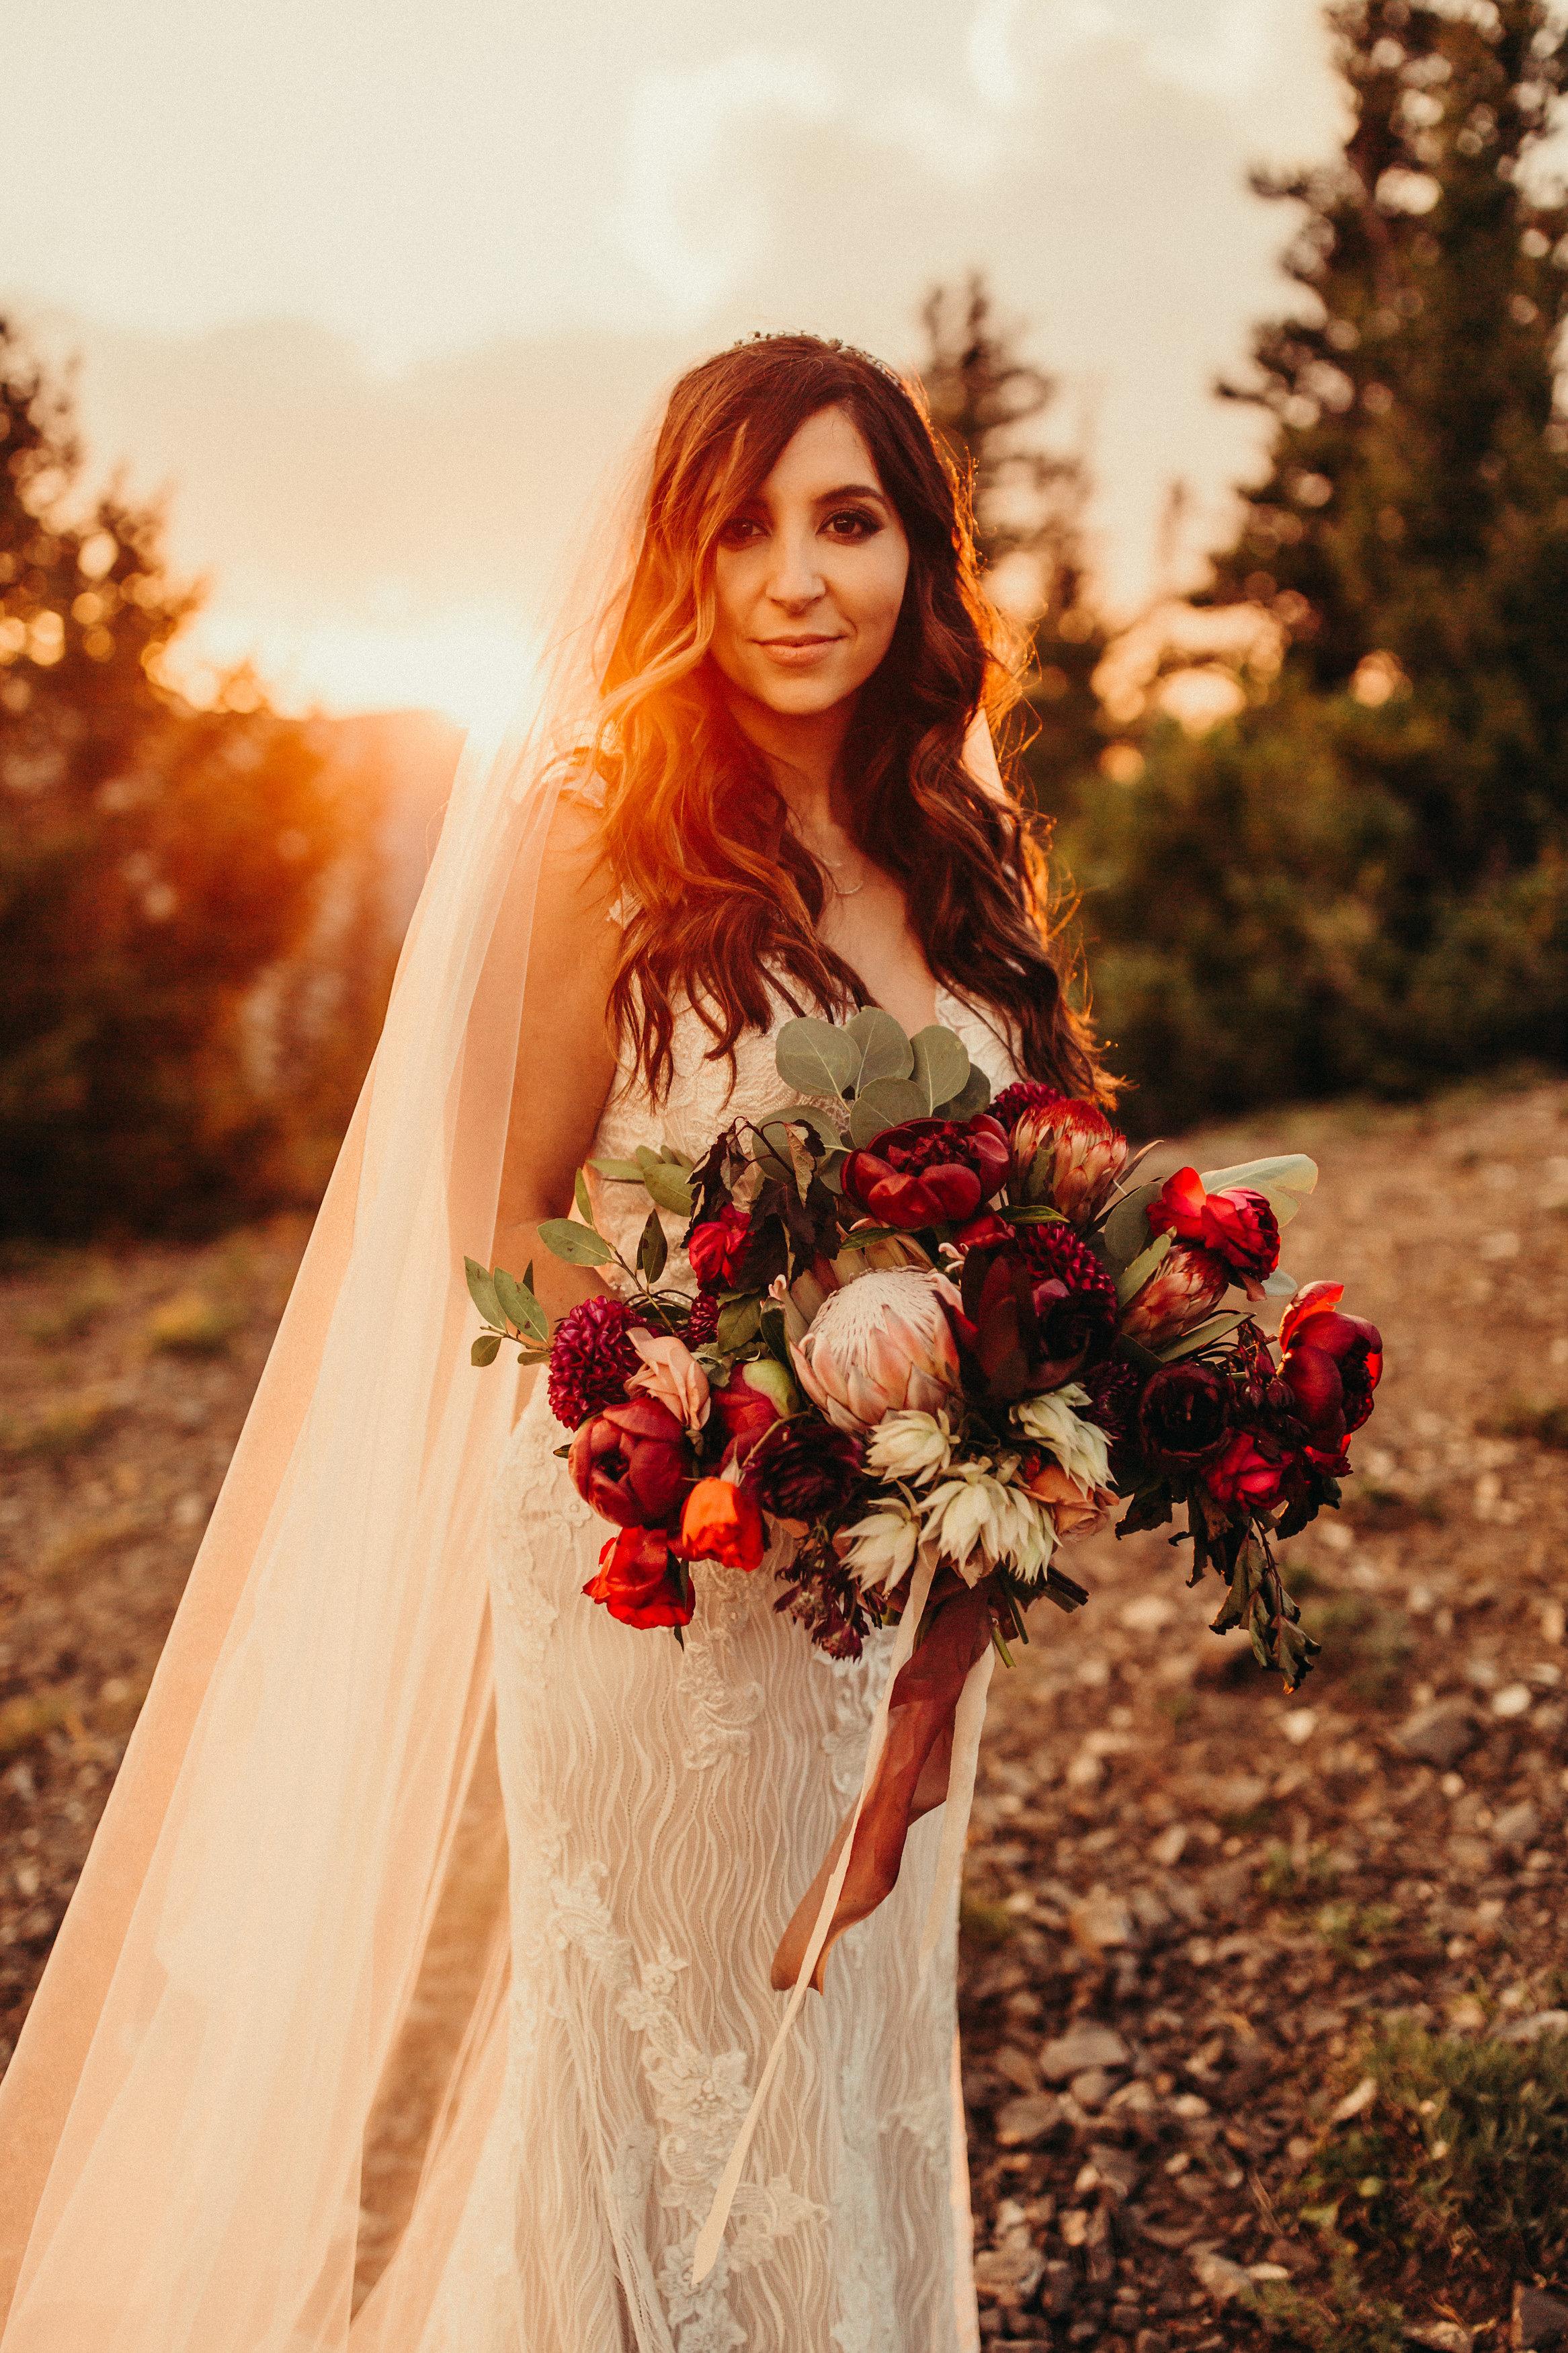 Aspen Wedding Florist